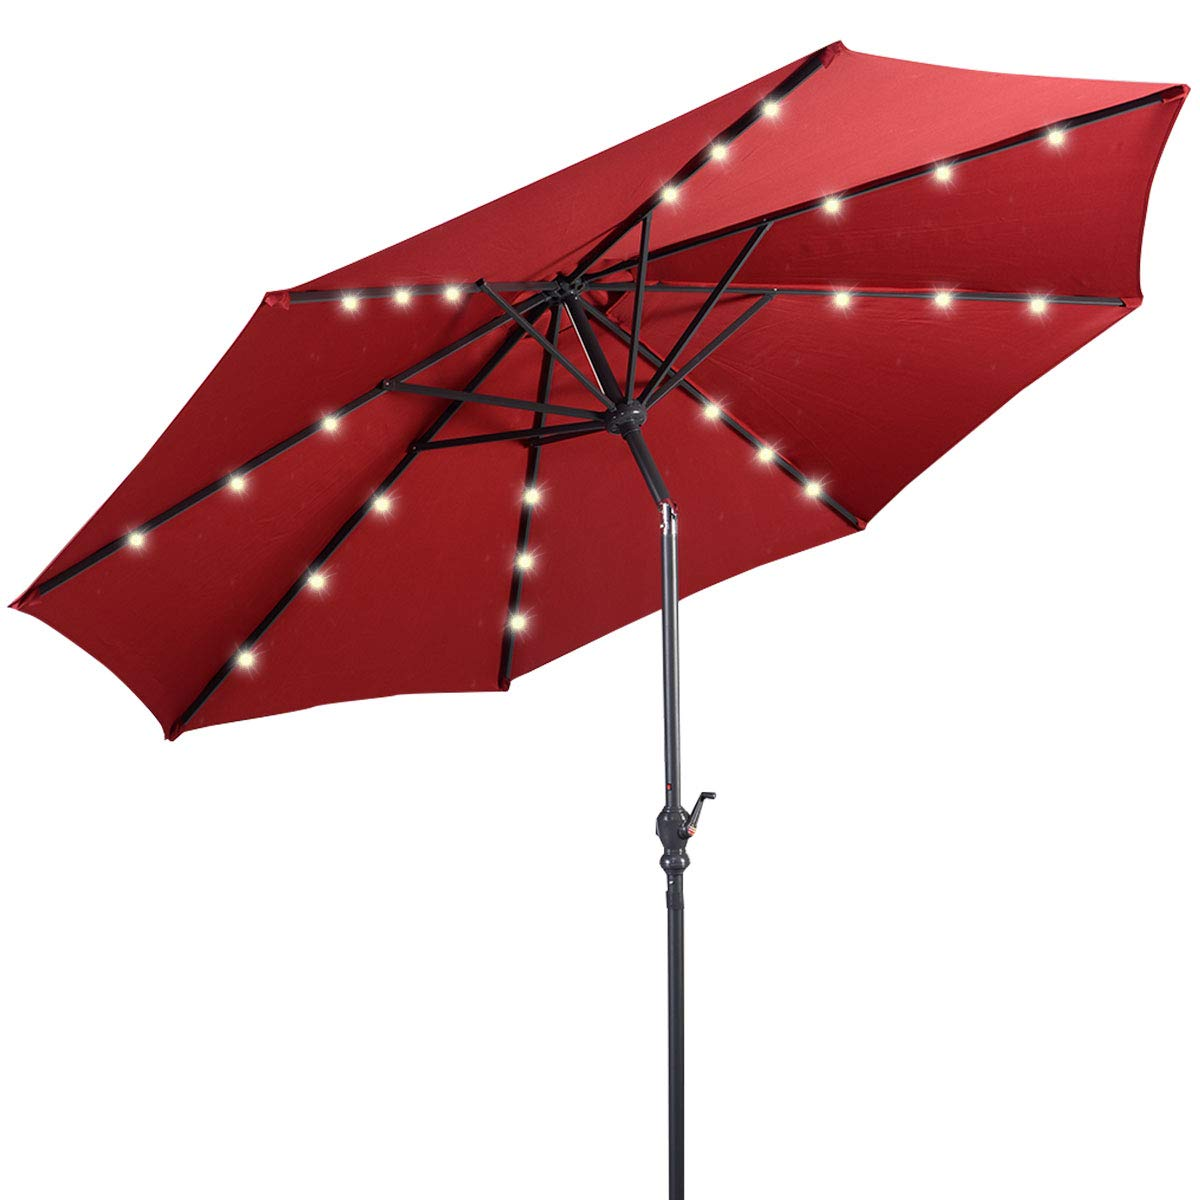 Giantex 10ft Solar Patio Umbrella Sunbrella with LED Lighted, 8 Ribs Market Steel Tilt w/Crank for Garden, Deck, Backyard, Pool Indoor Outdoor Use, Burgundy by Giantex